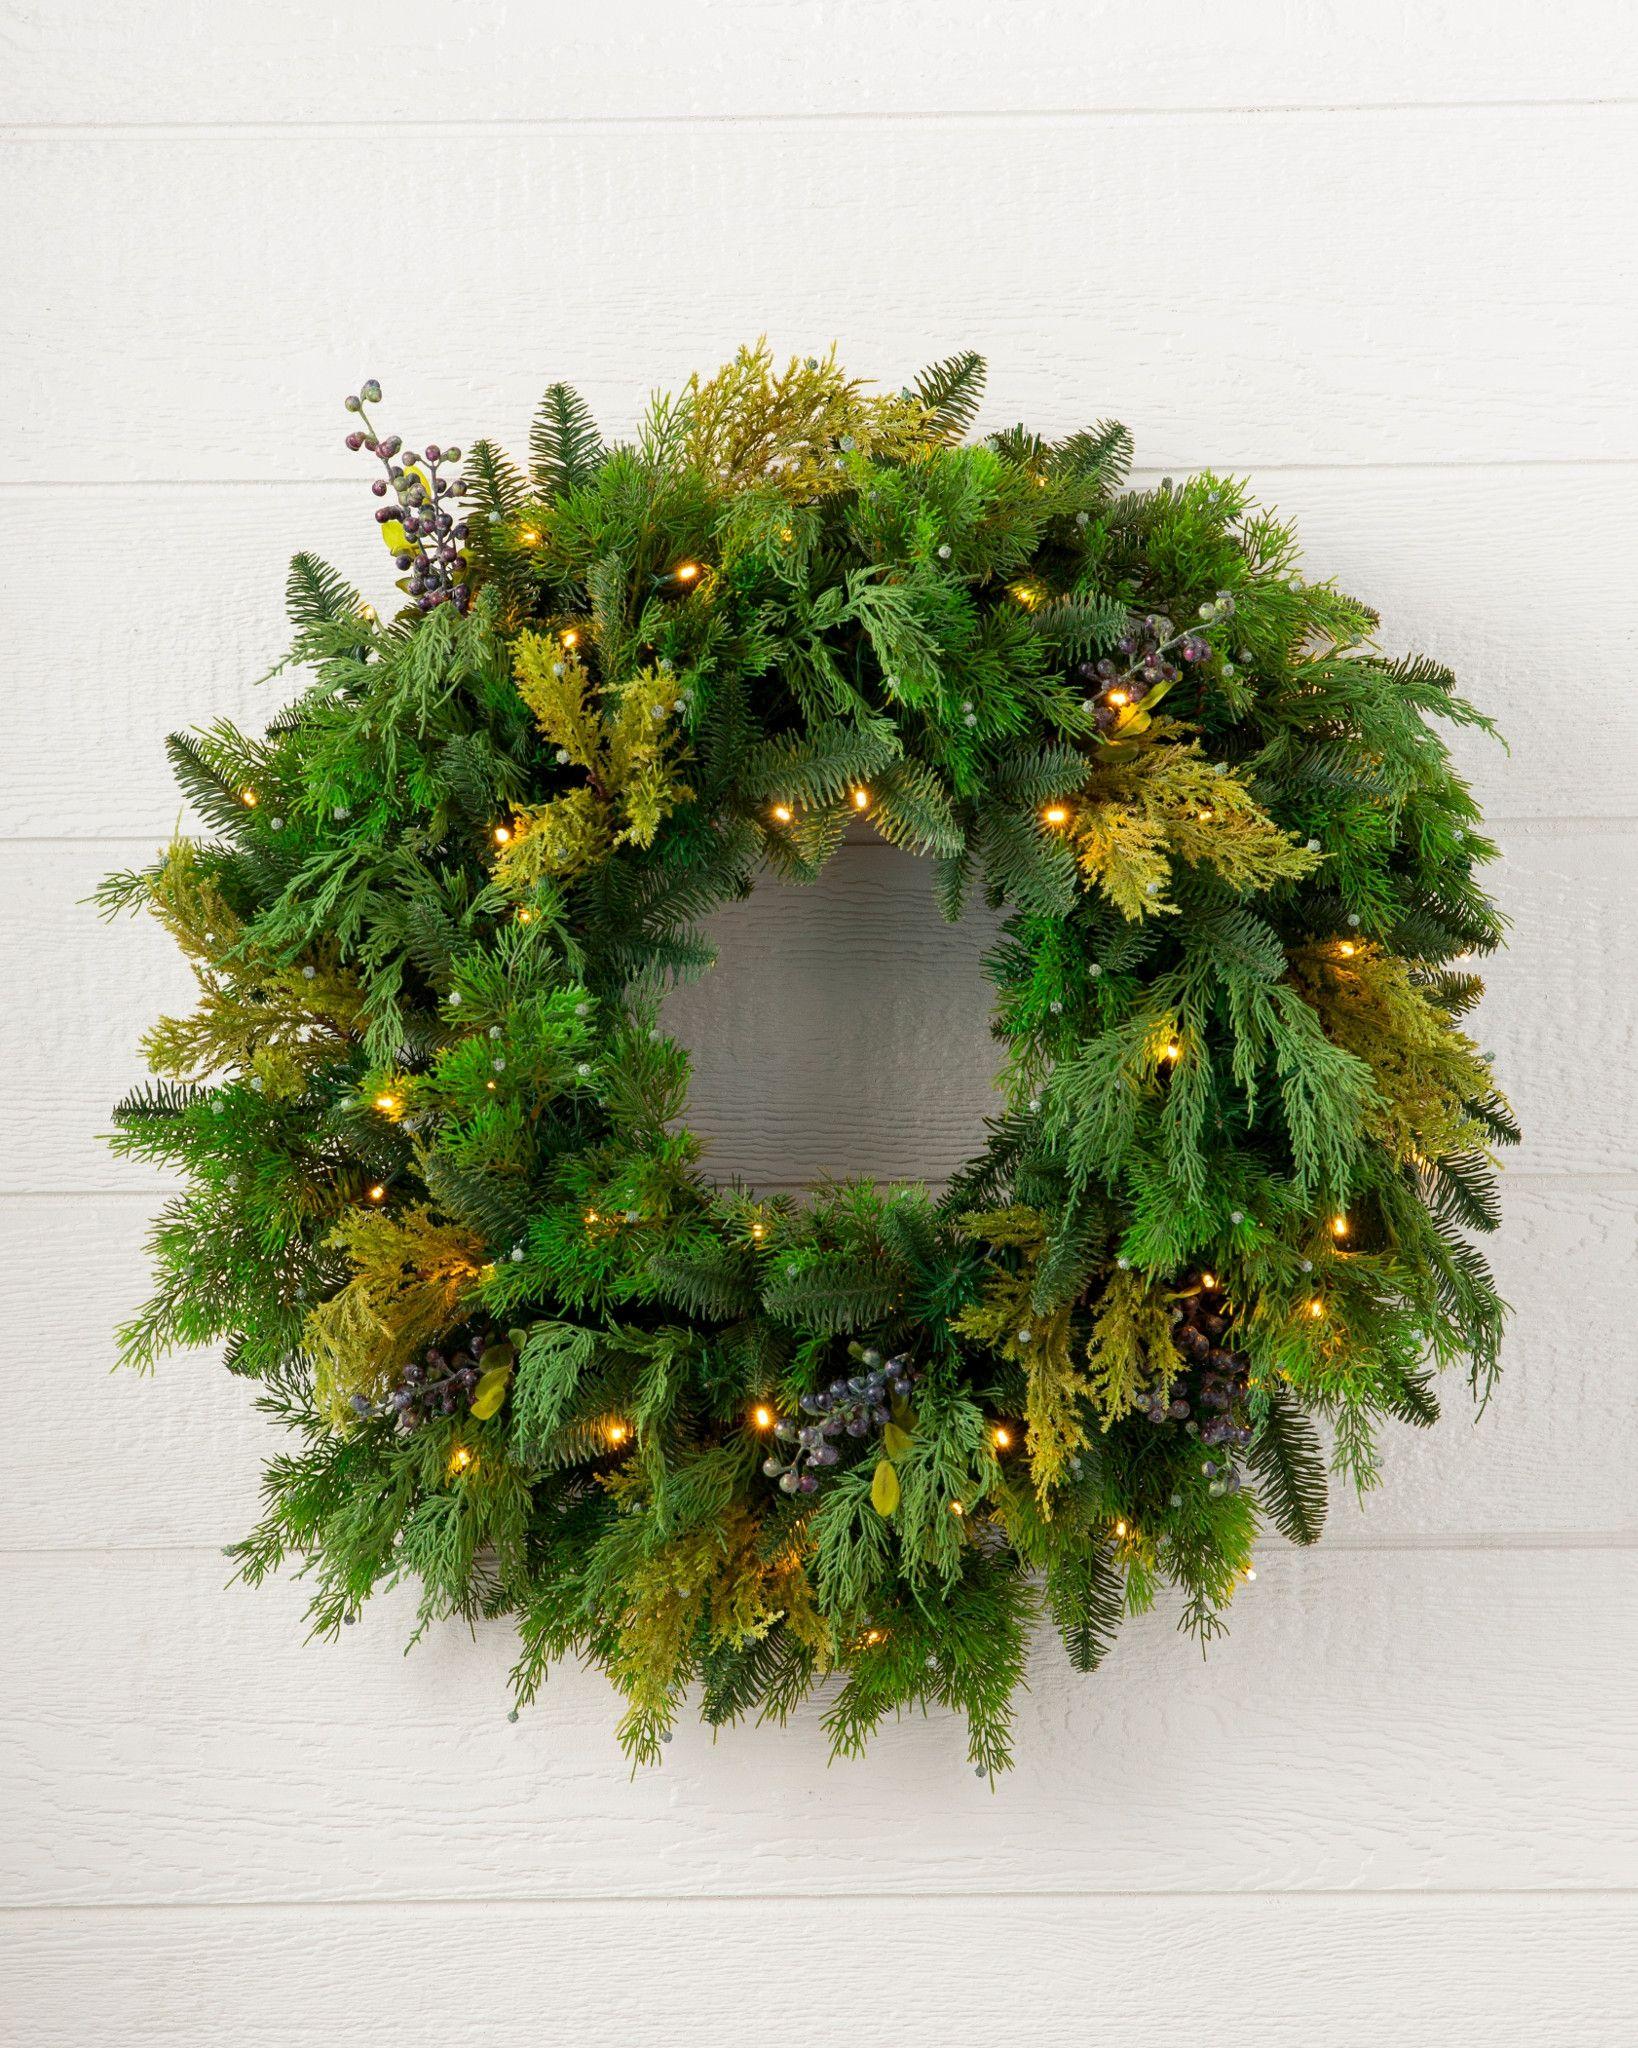 Faux Outdoor Juniper Pine Wreath by Balsam Hill